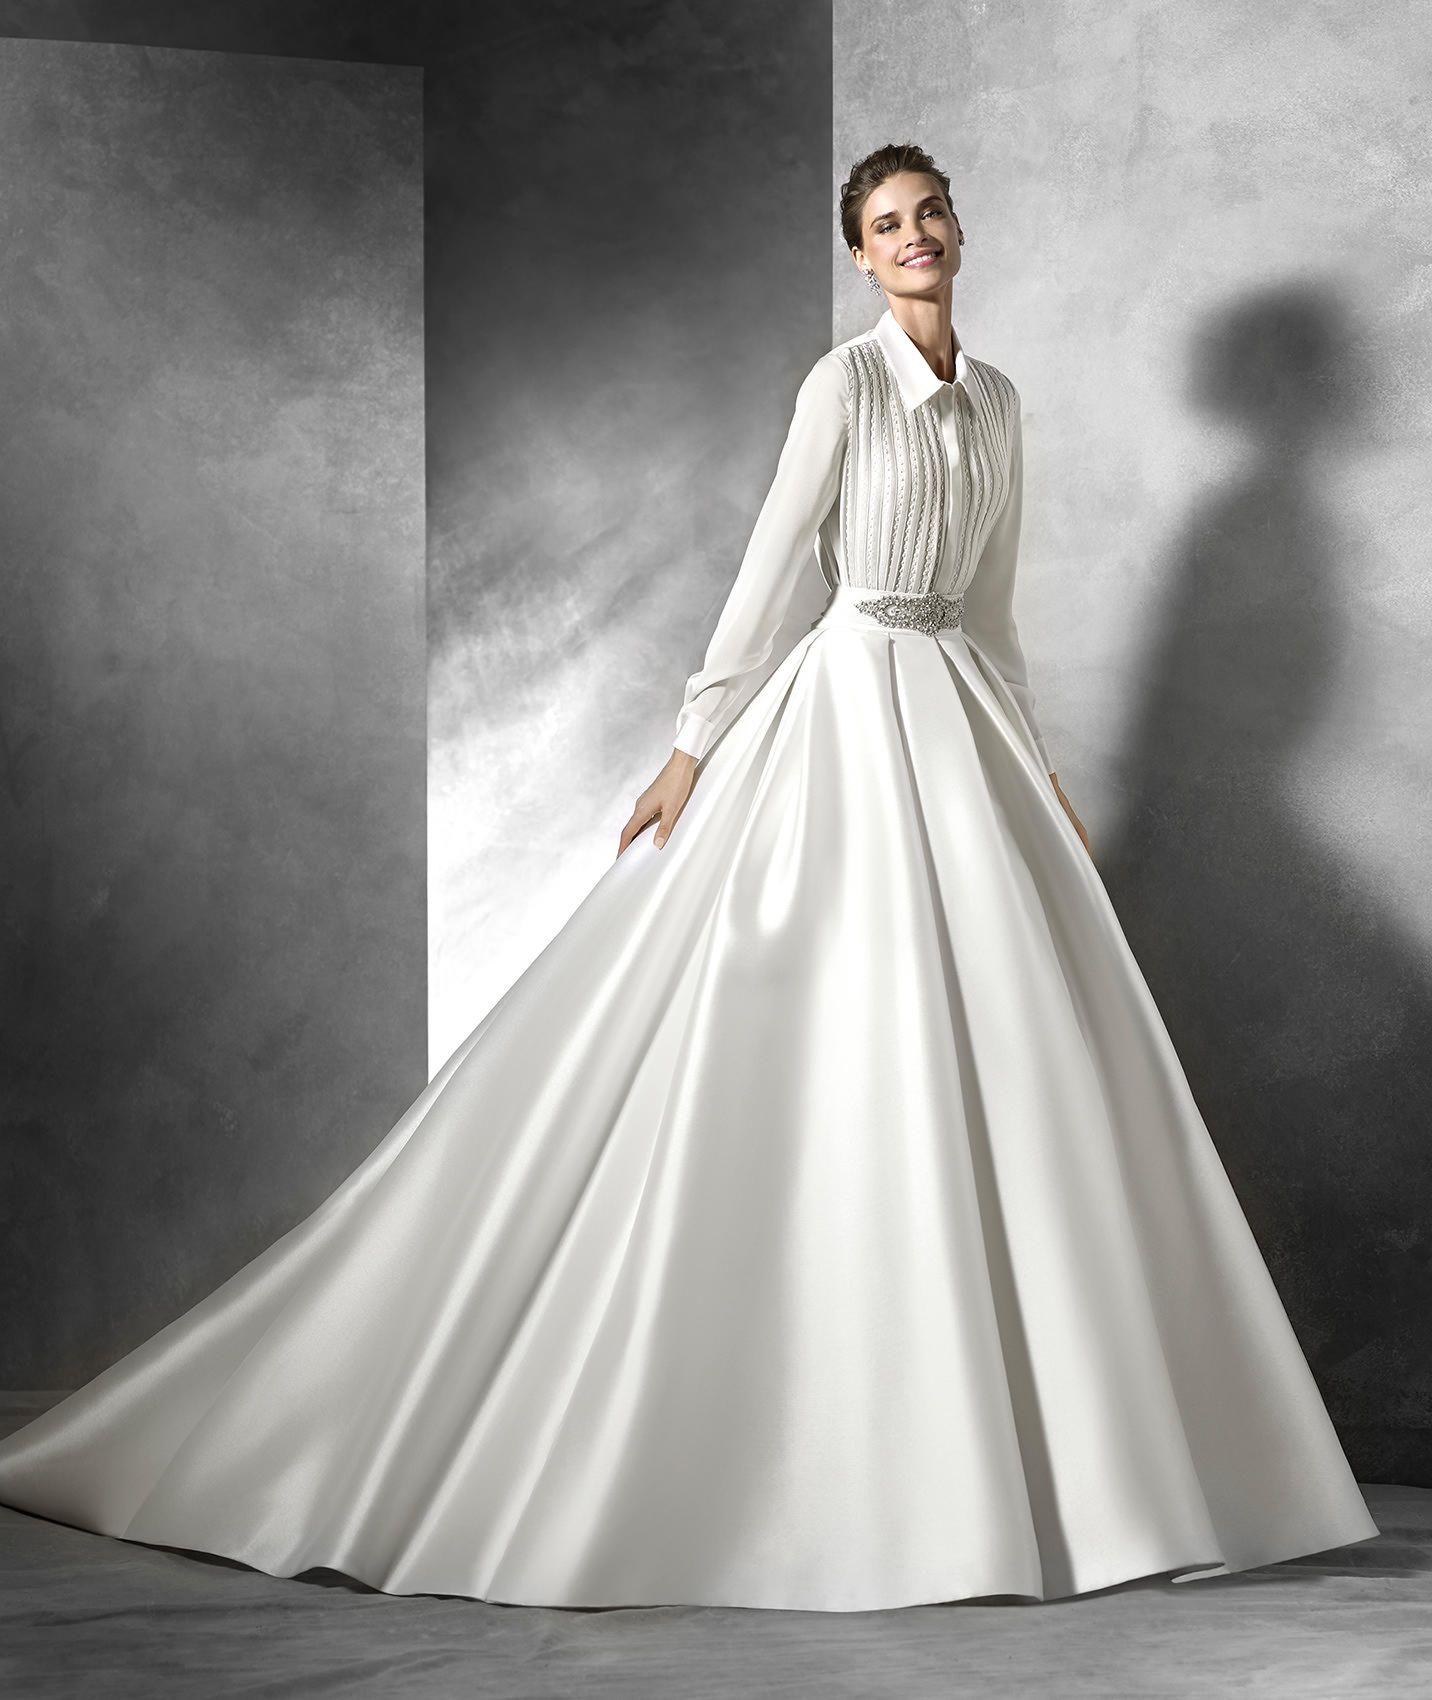 TARIFA - Sexy Brautkleid mit herzförmigem Dekolleté ...